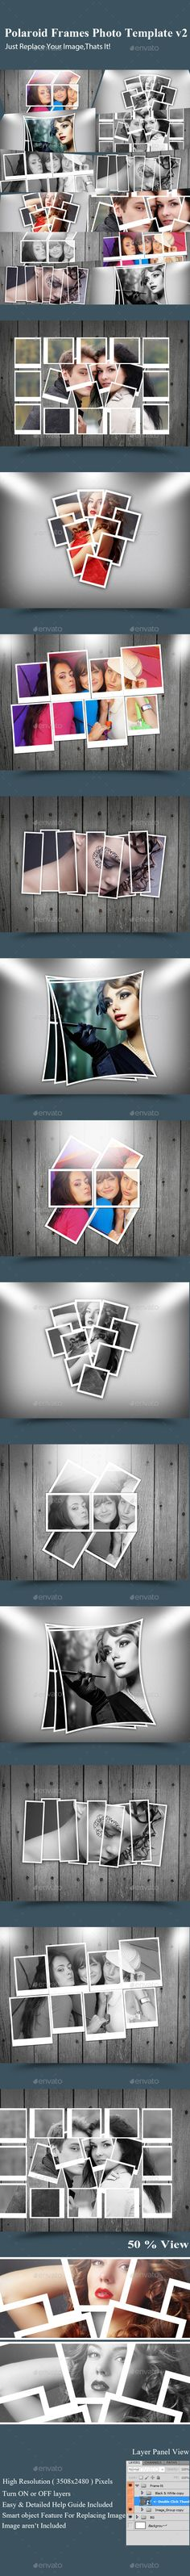 Polaroid Frames Photo Template v2 Polaroid frame and Template - polaroid template